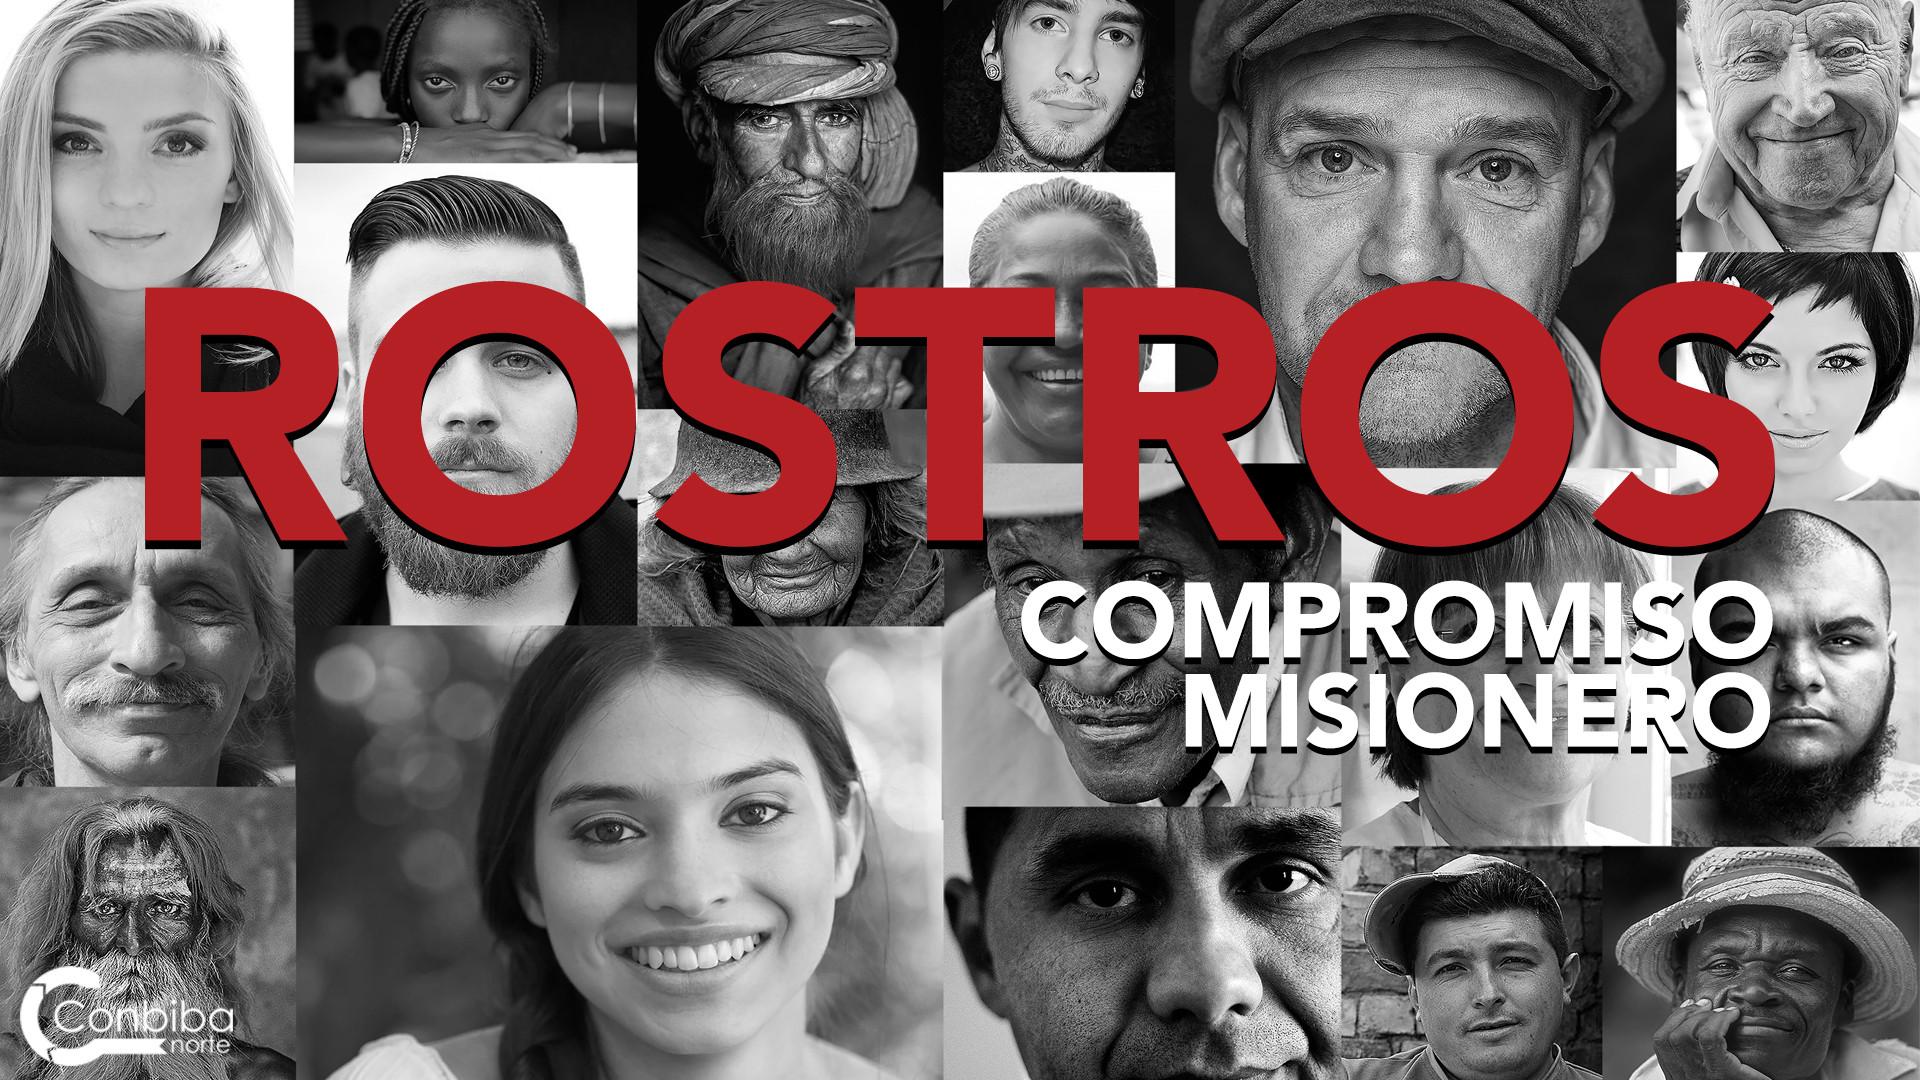 Rostros-Title-HD-1.jpg